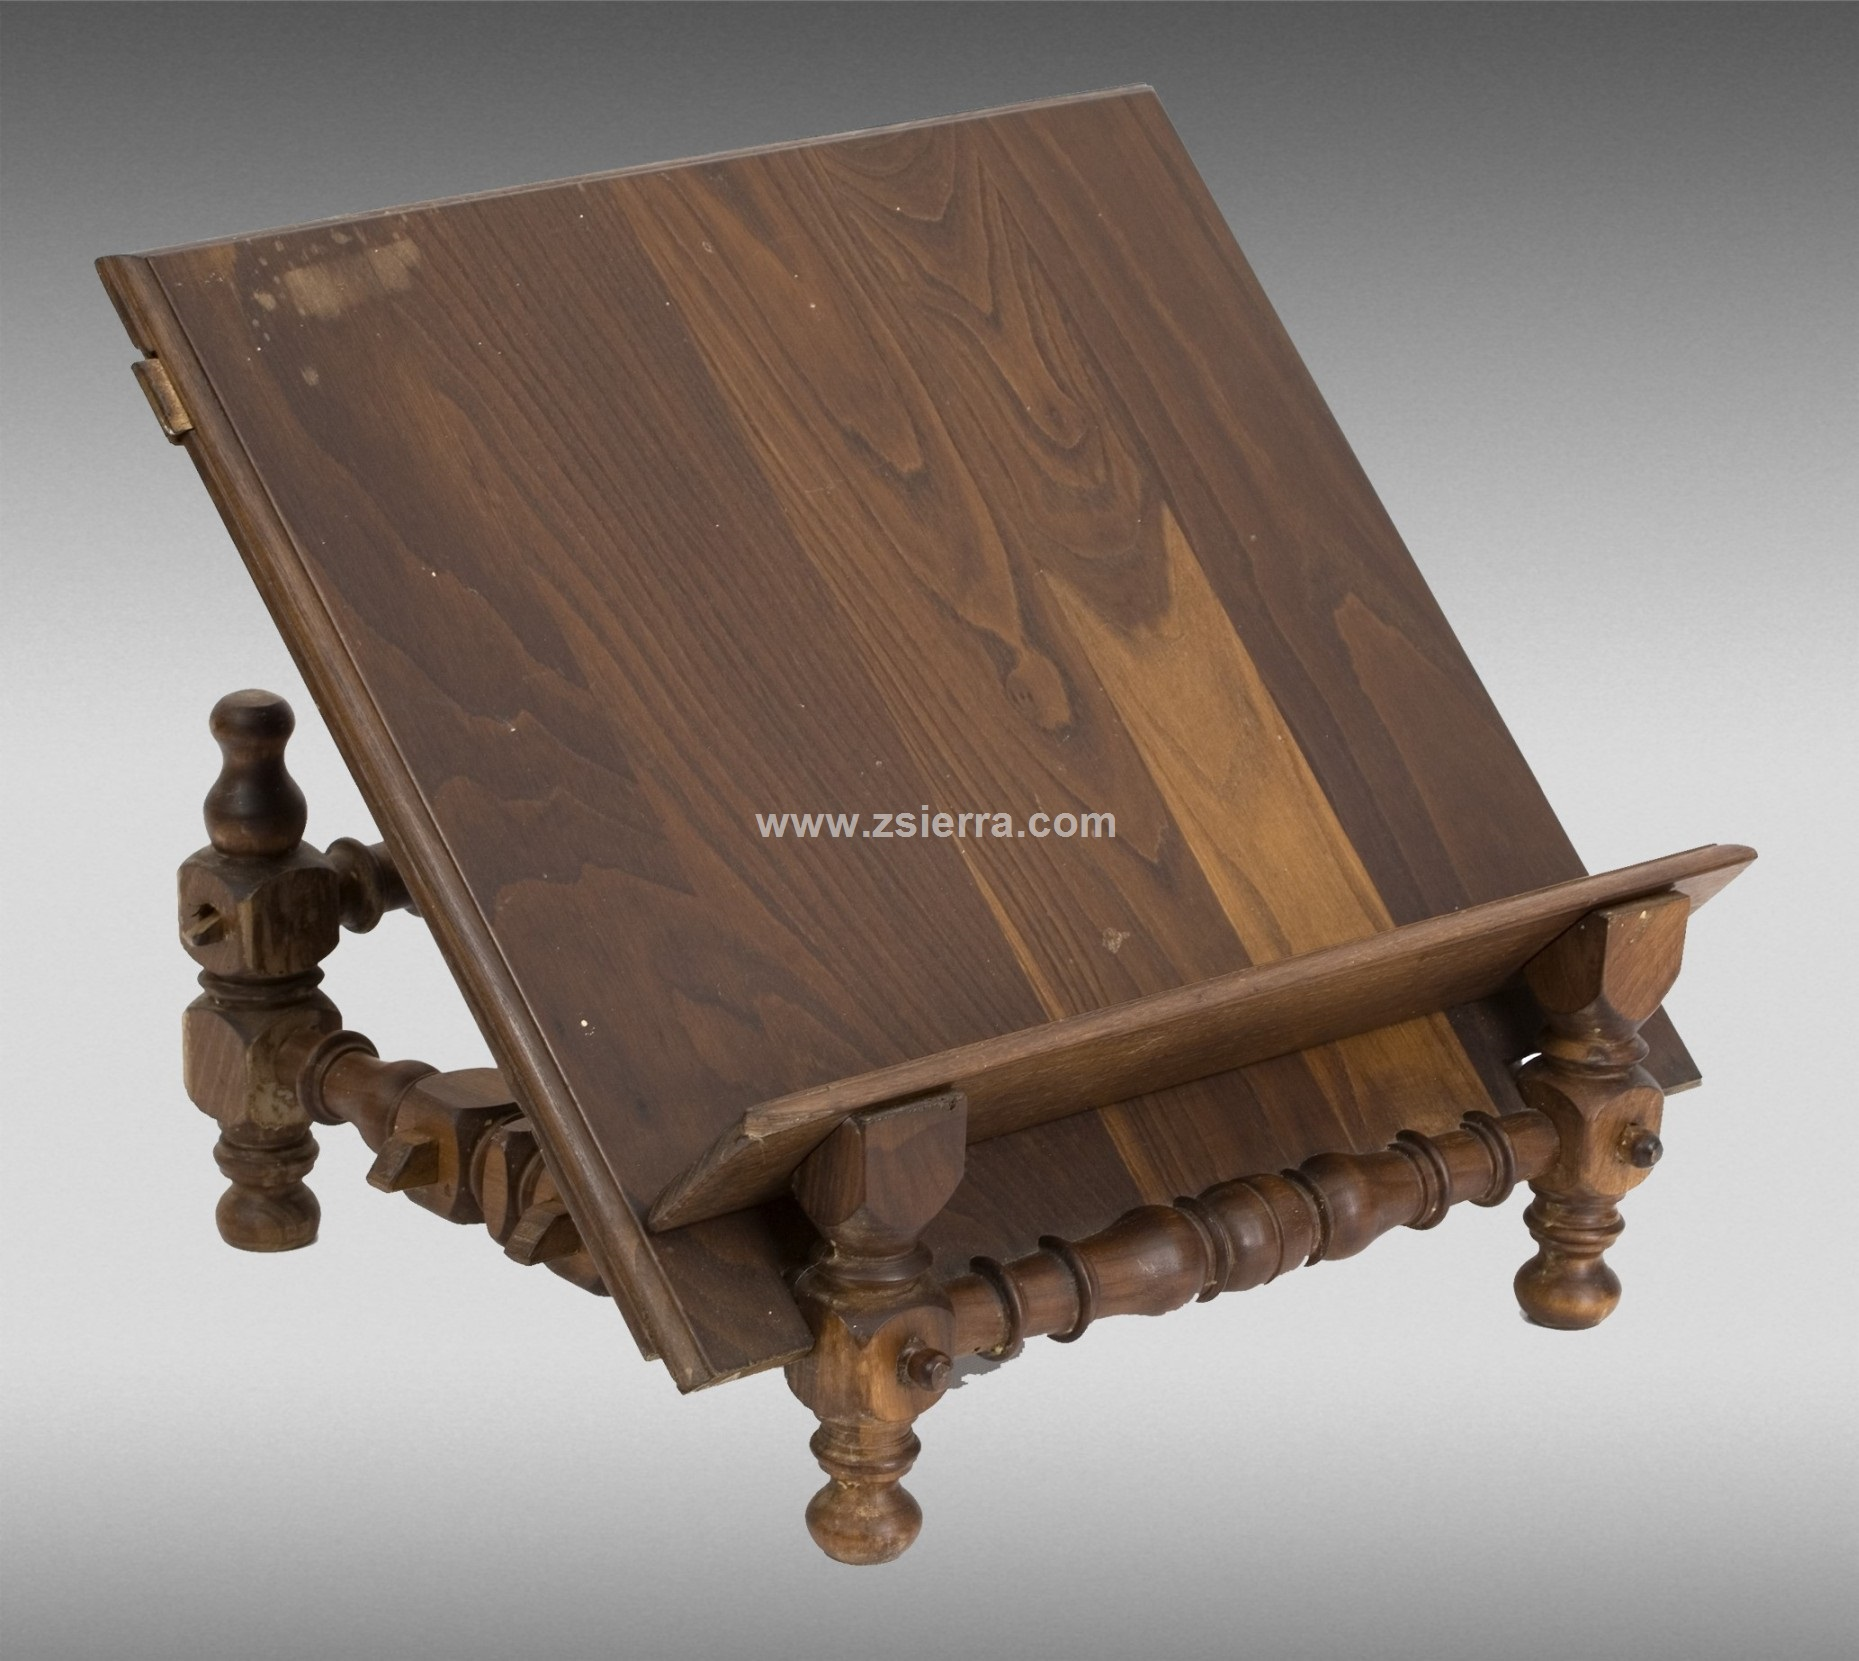 Z sierra antig edades y objetos de decoraci n atril madera torneado 31x40x31 cms - Atril decoracion ...